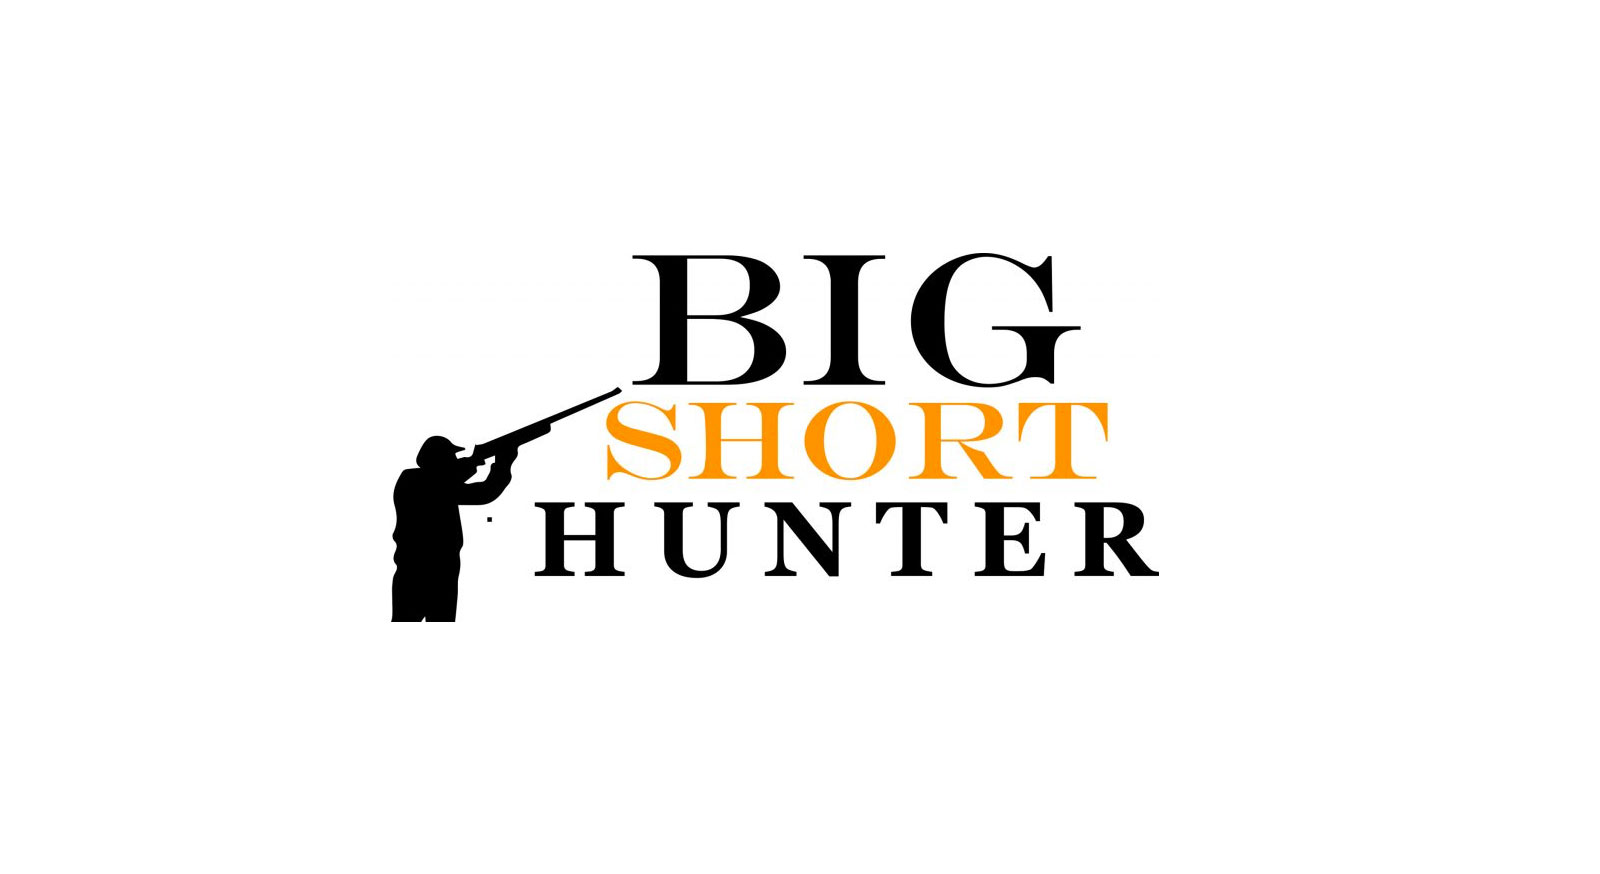 Big Short Hunter